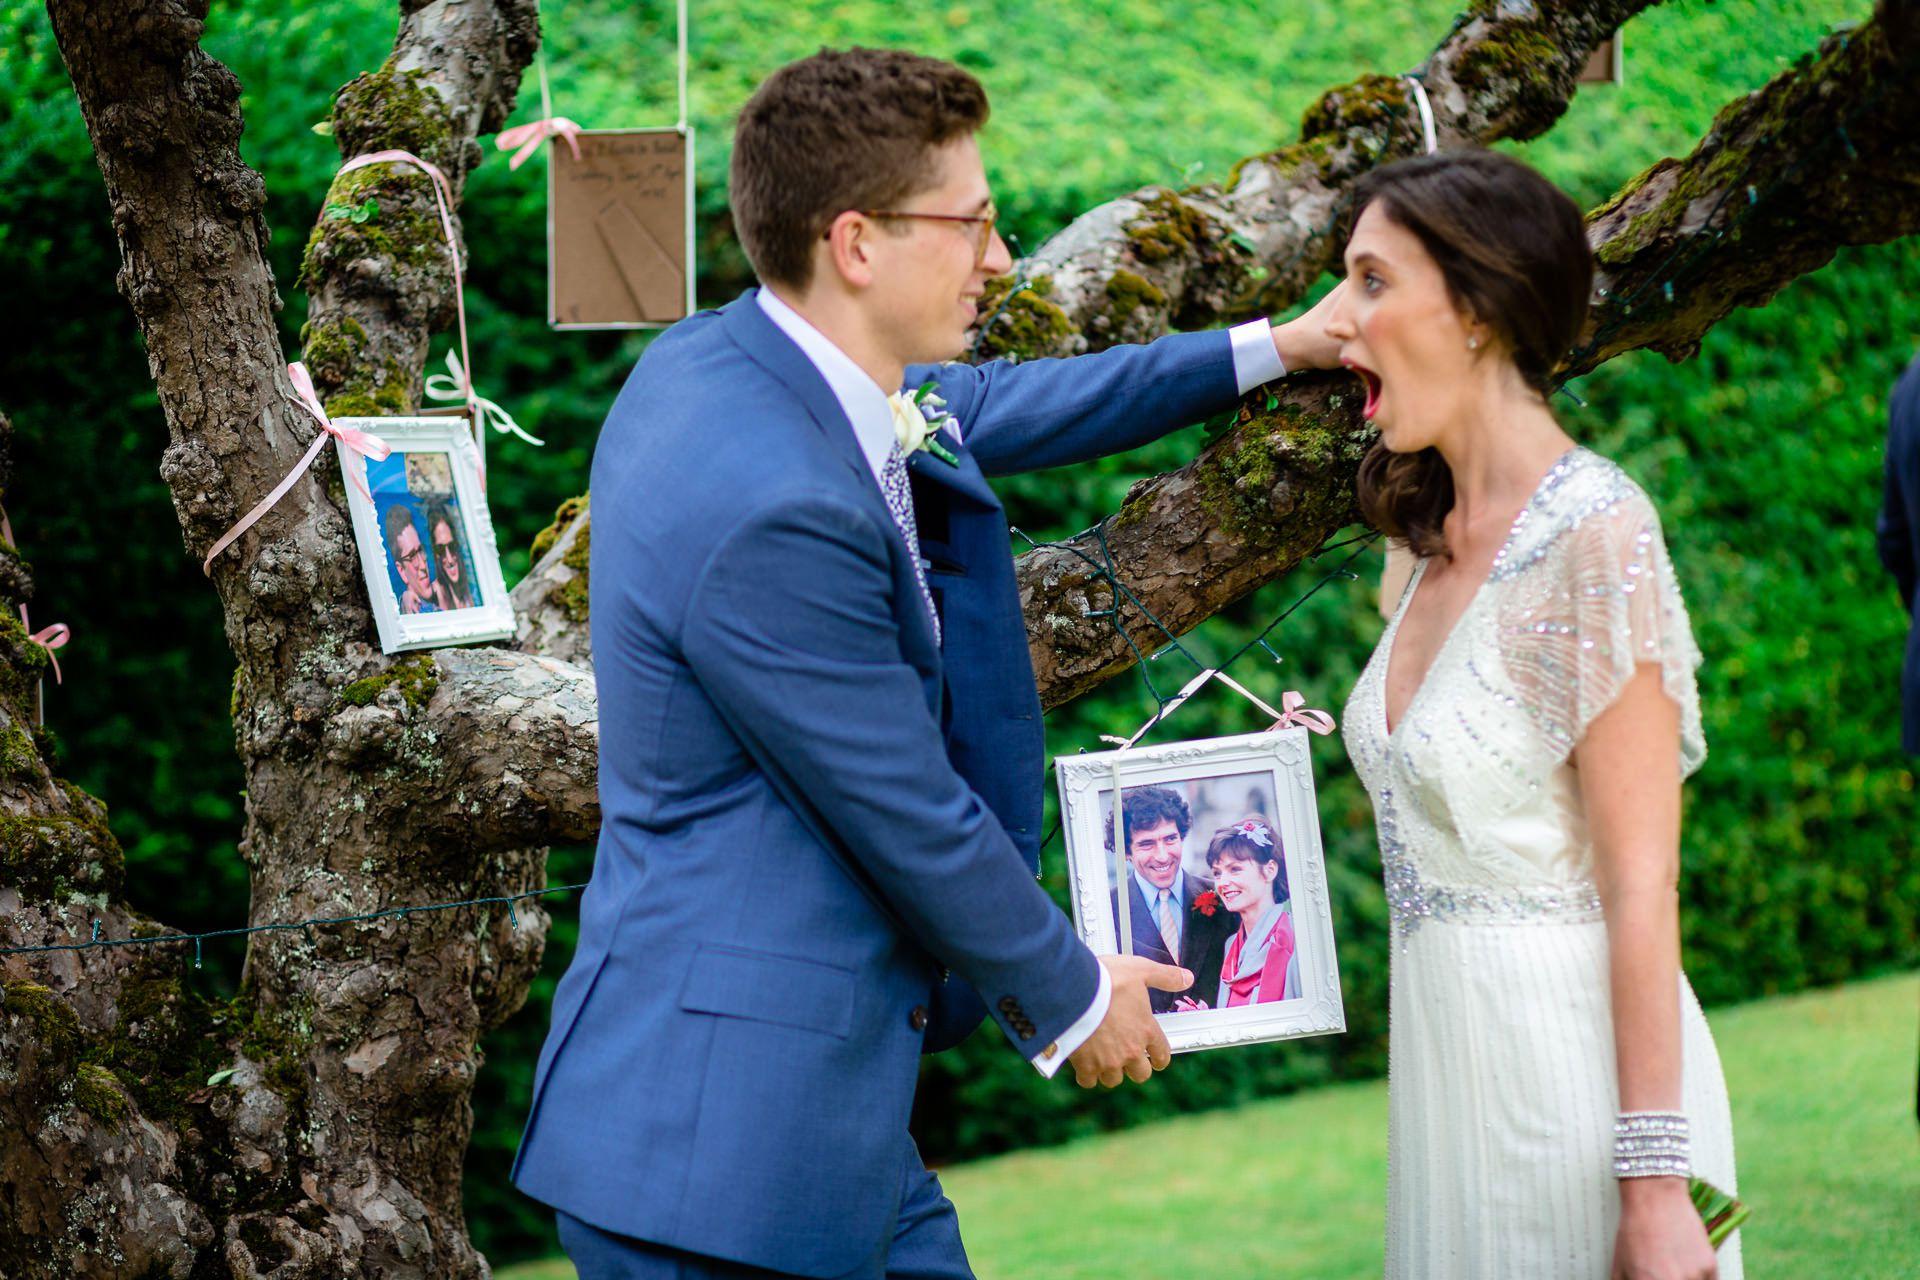 julia and rob and the wedding photos